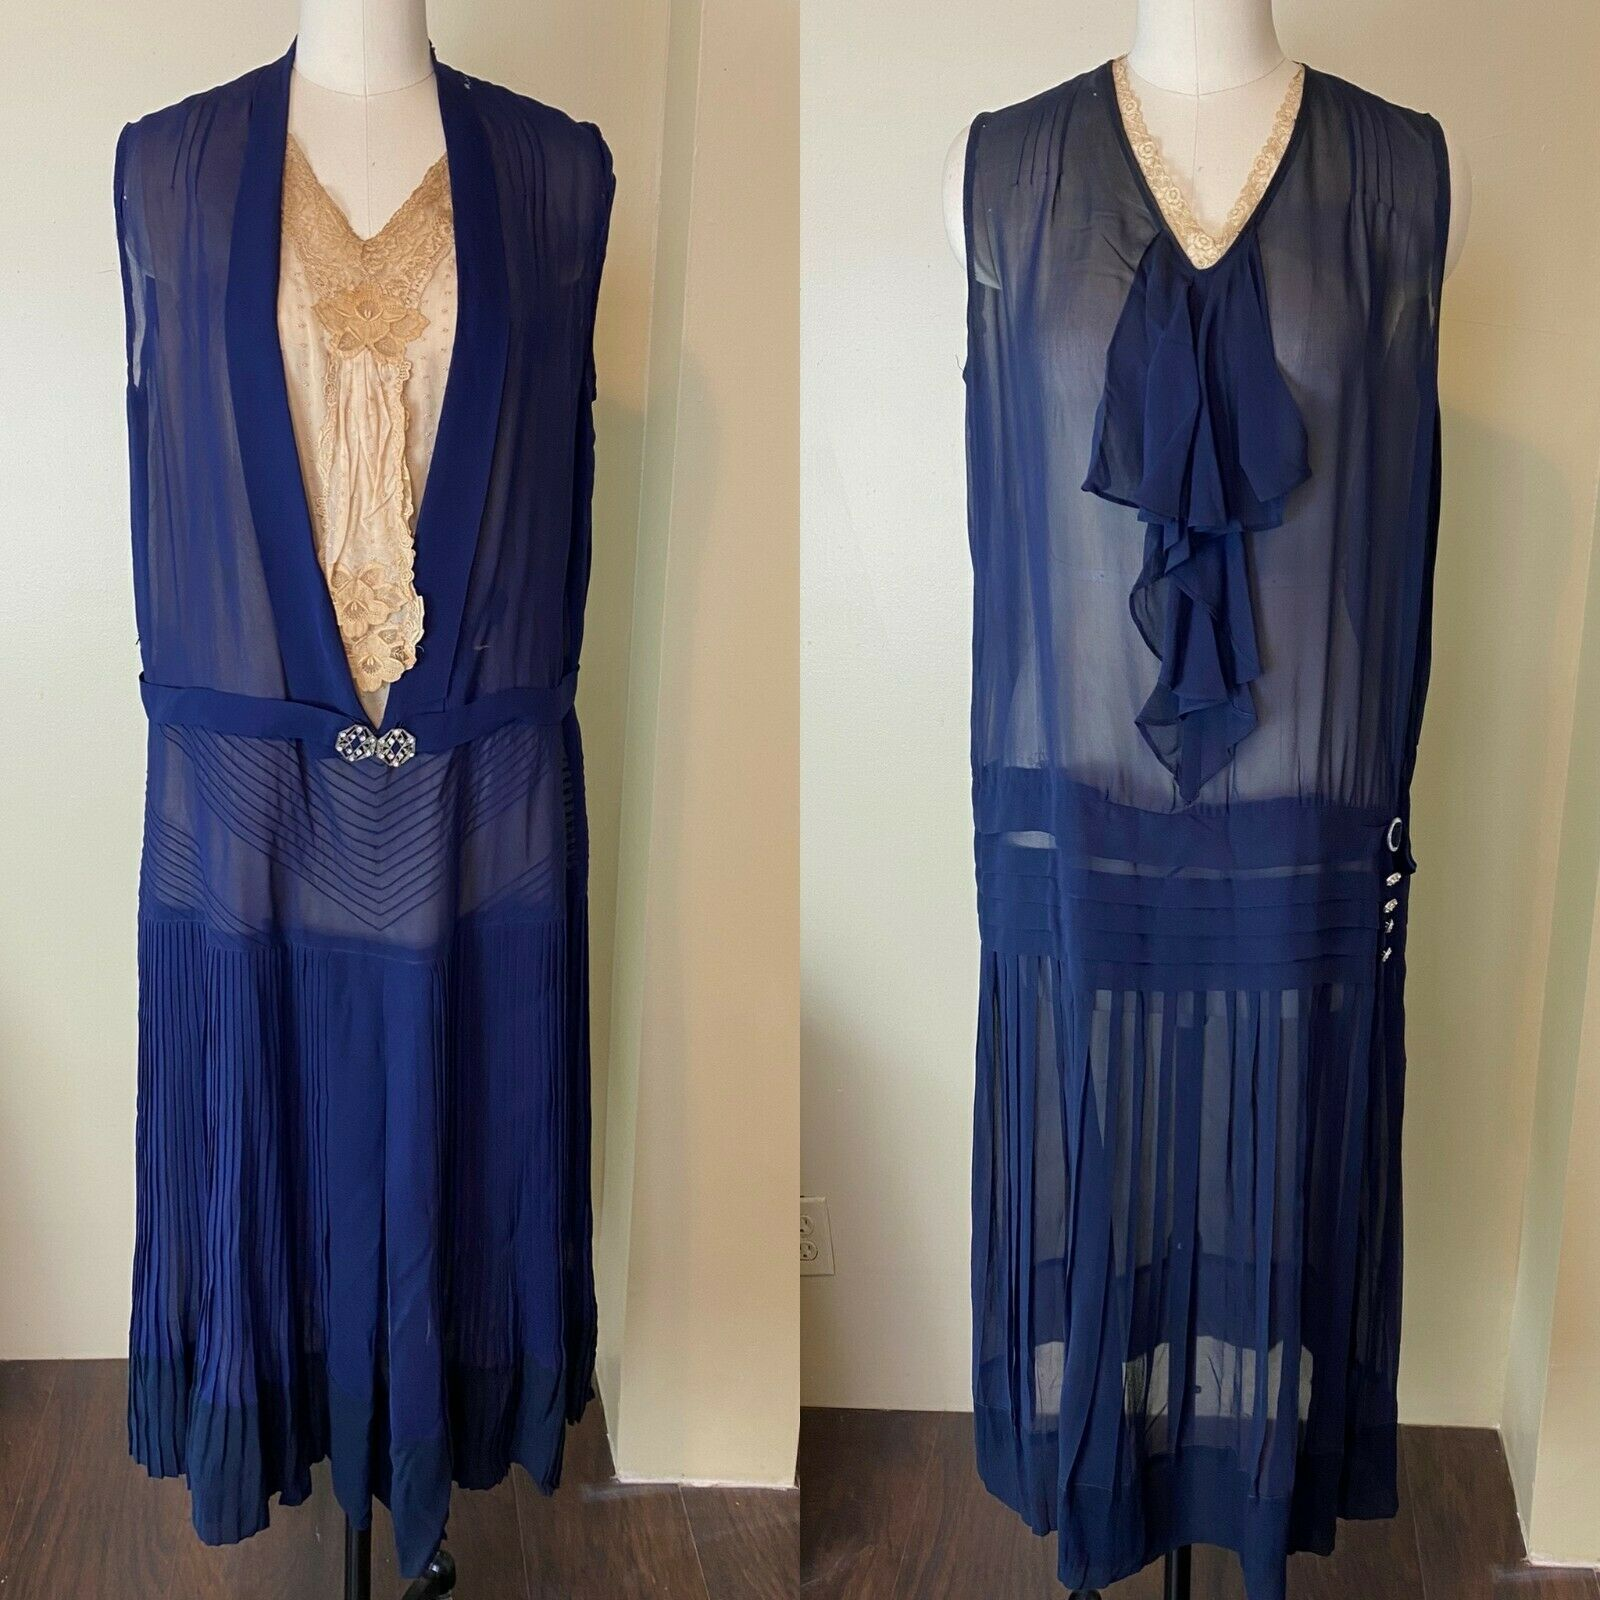 Vintage 1920s Blue Silk Chiffon Dress Lot of 2 - image 1